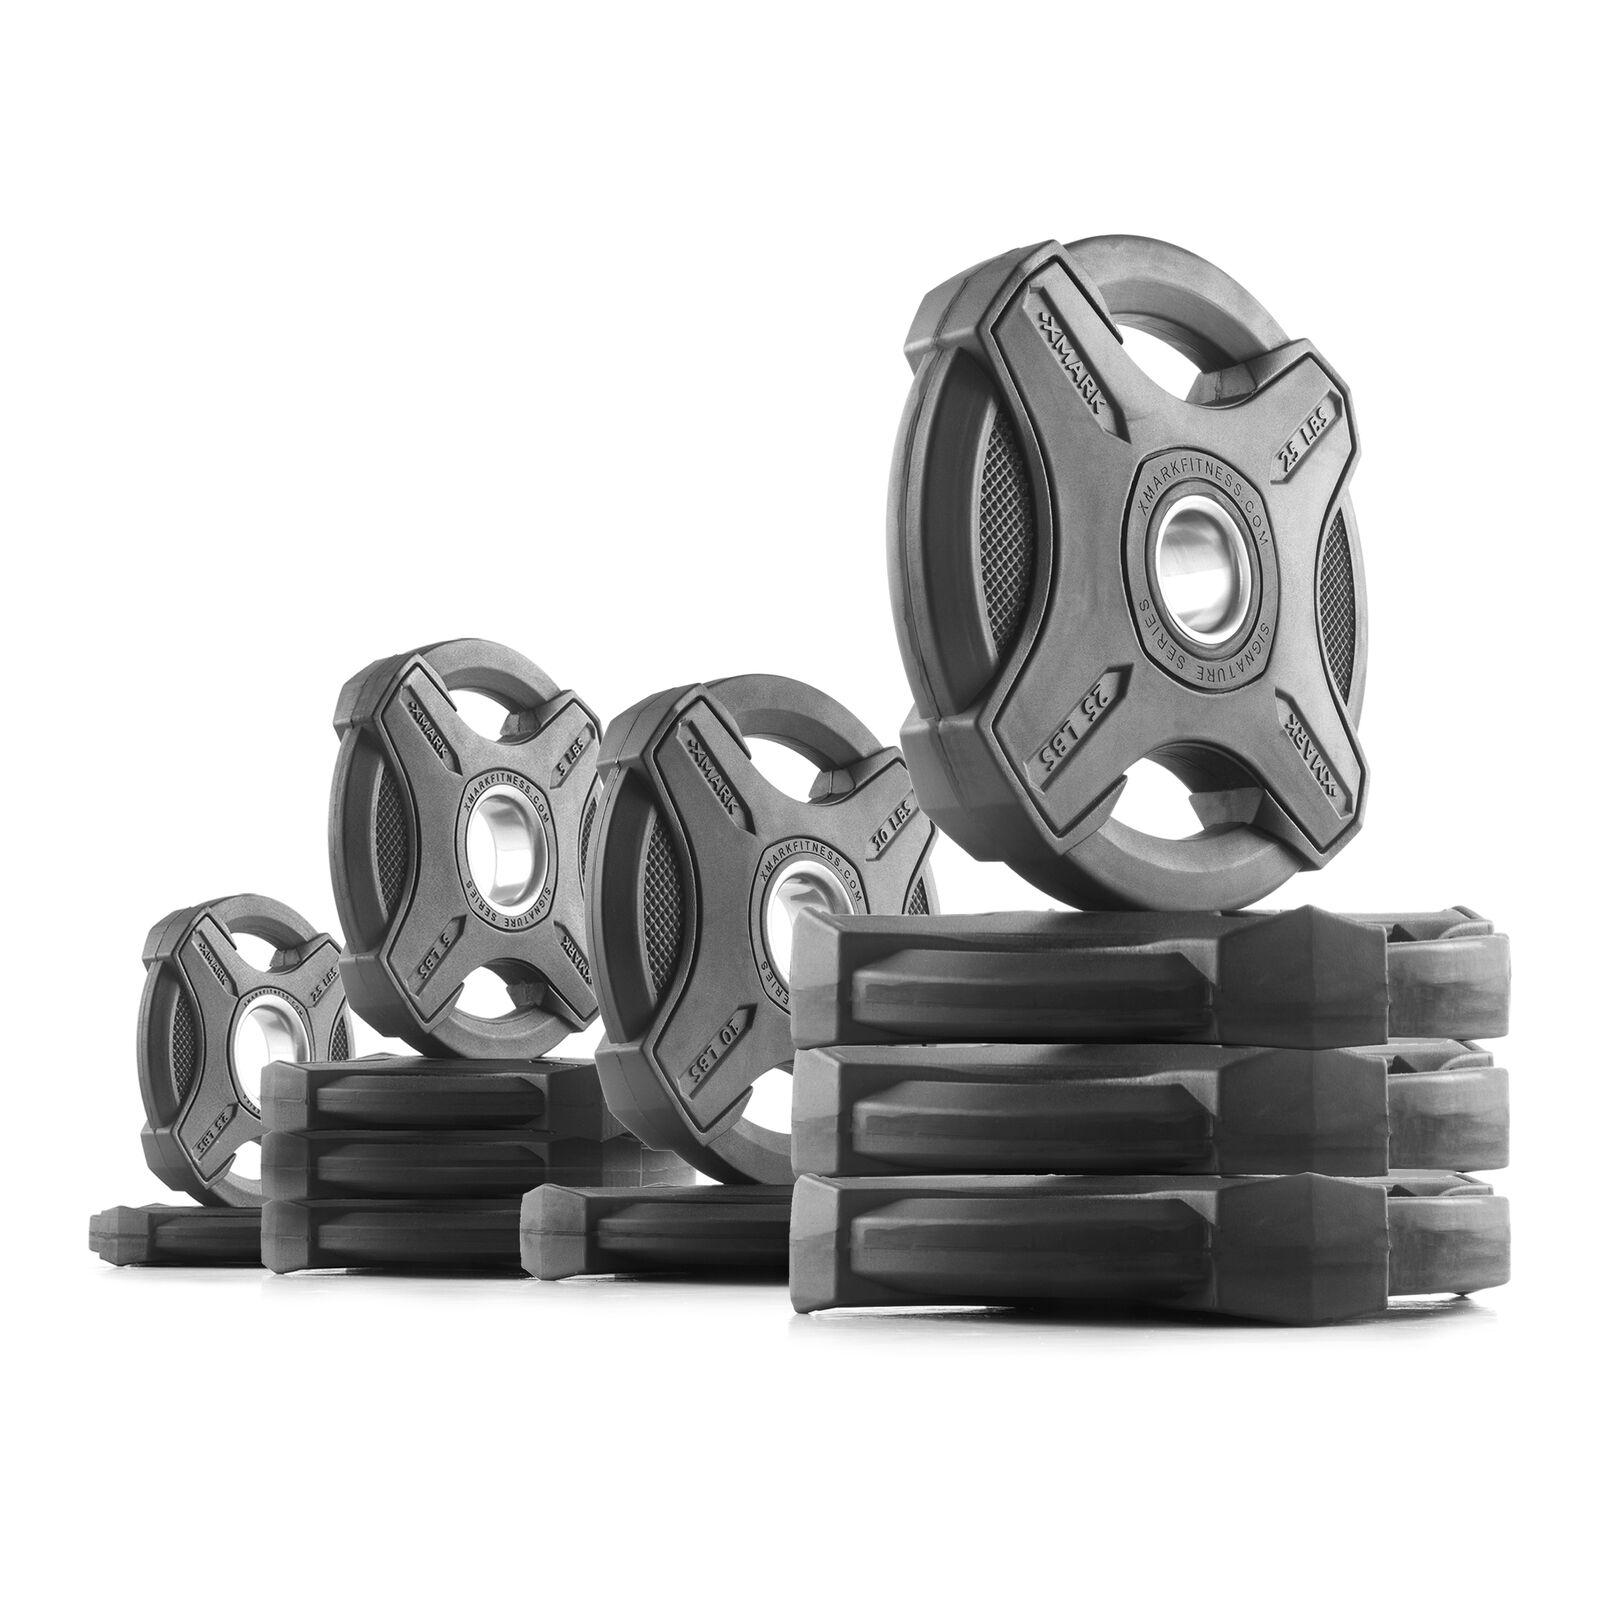 XMark  SIGNATURE Series Olympic Plate Weights (145 lb. Set) SIGNATURE-BAL-145  high quaity